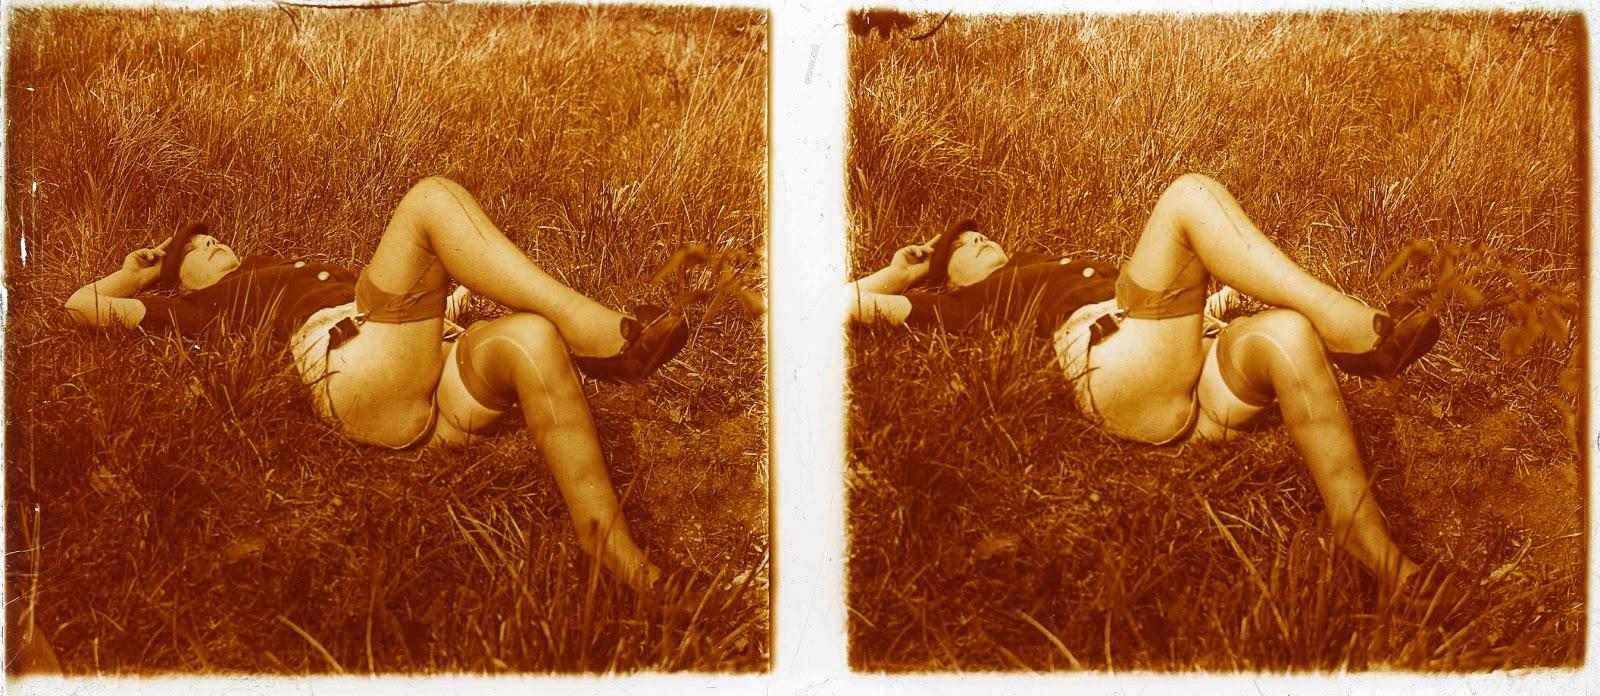 Soft mature nude women